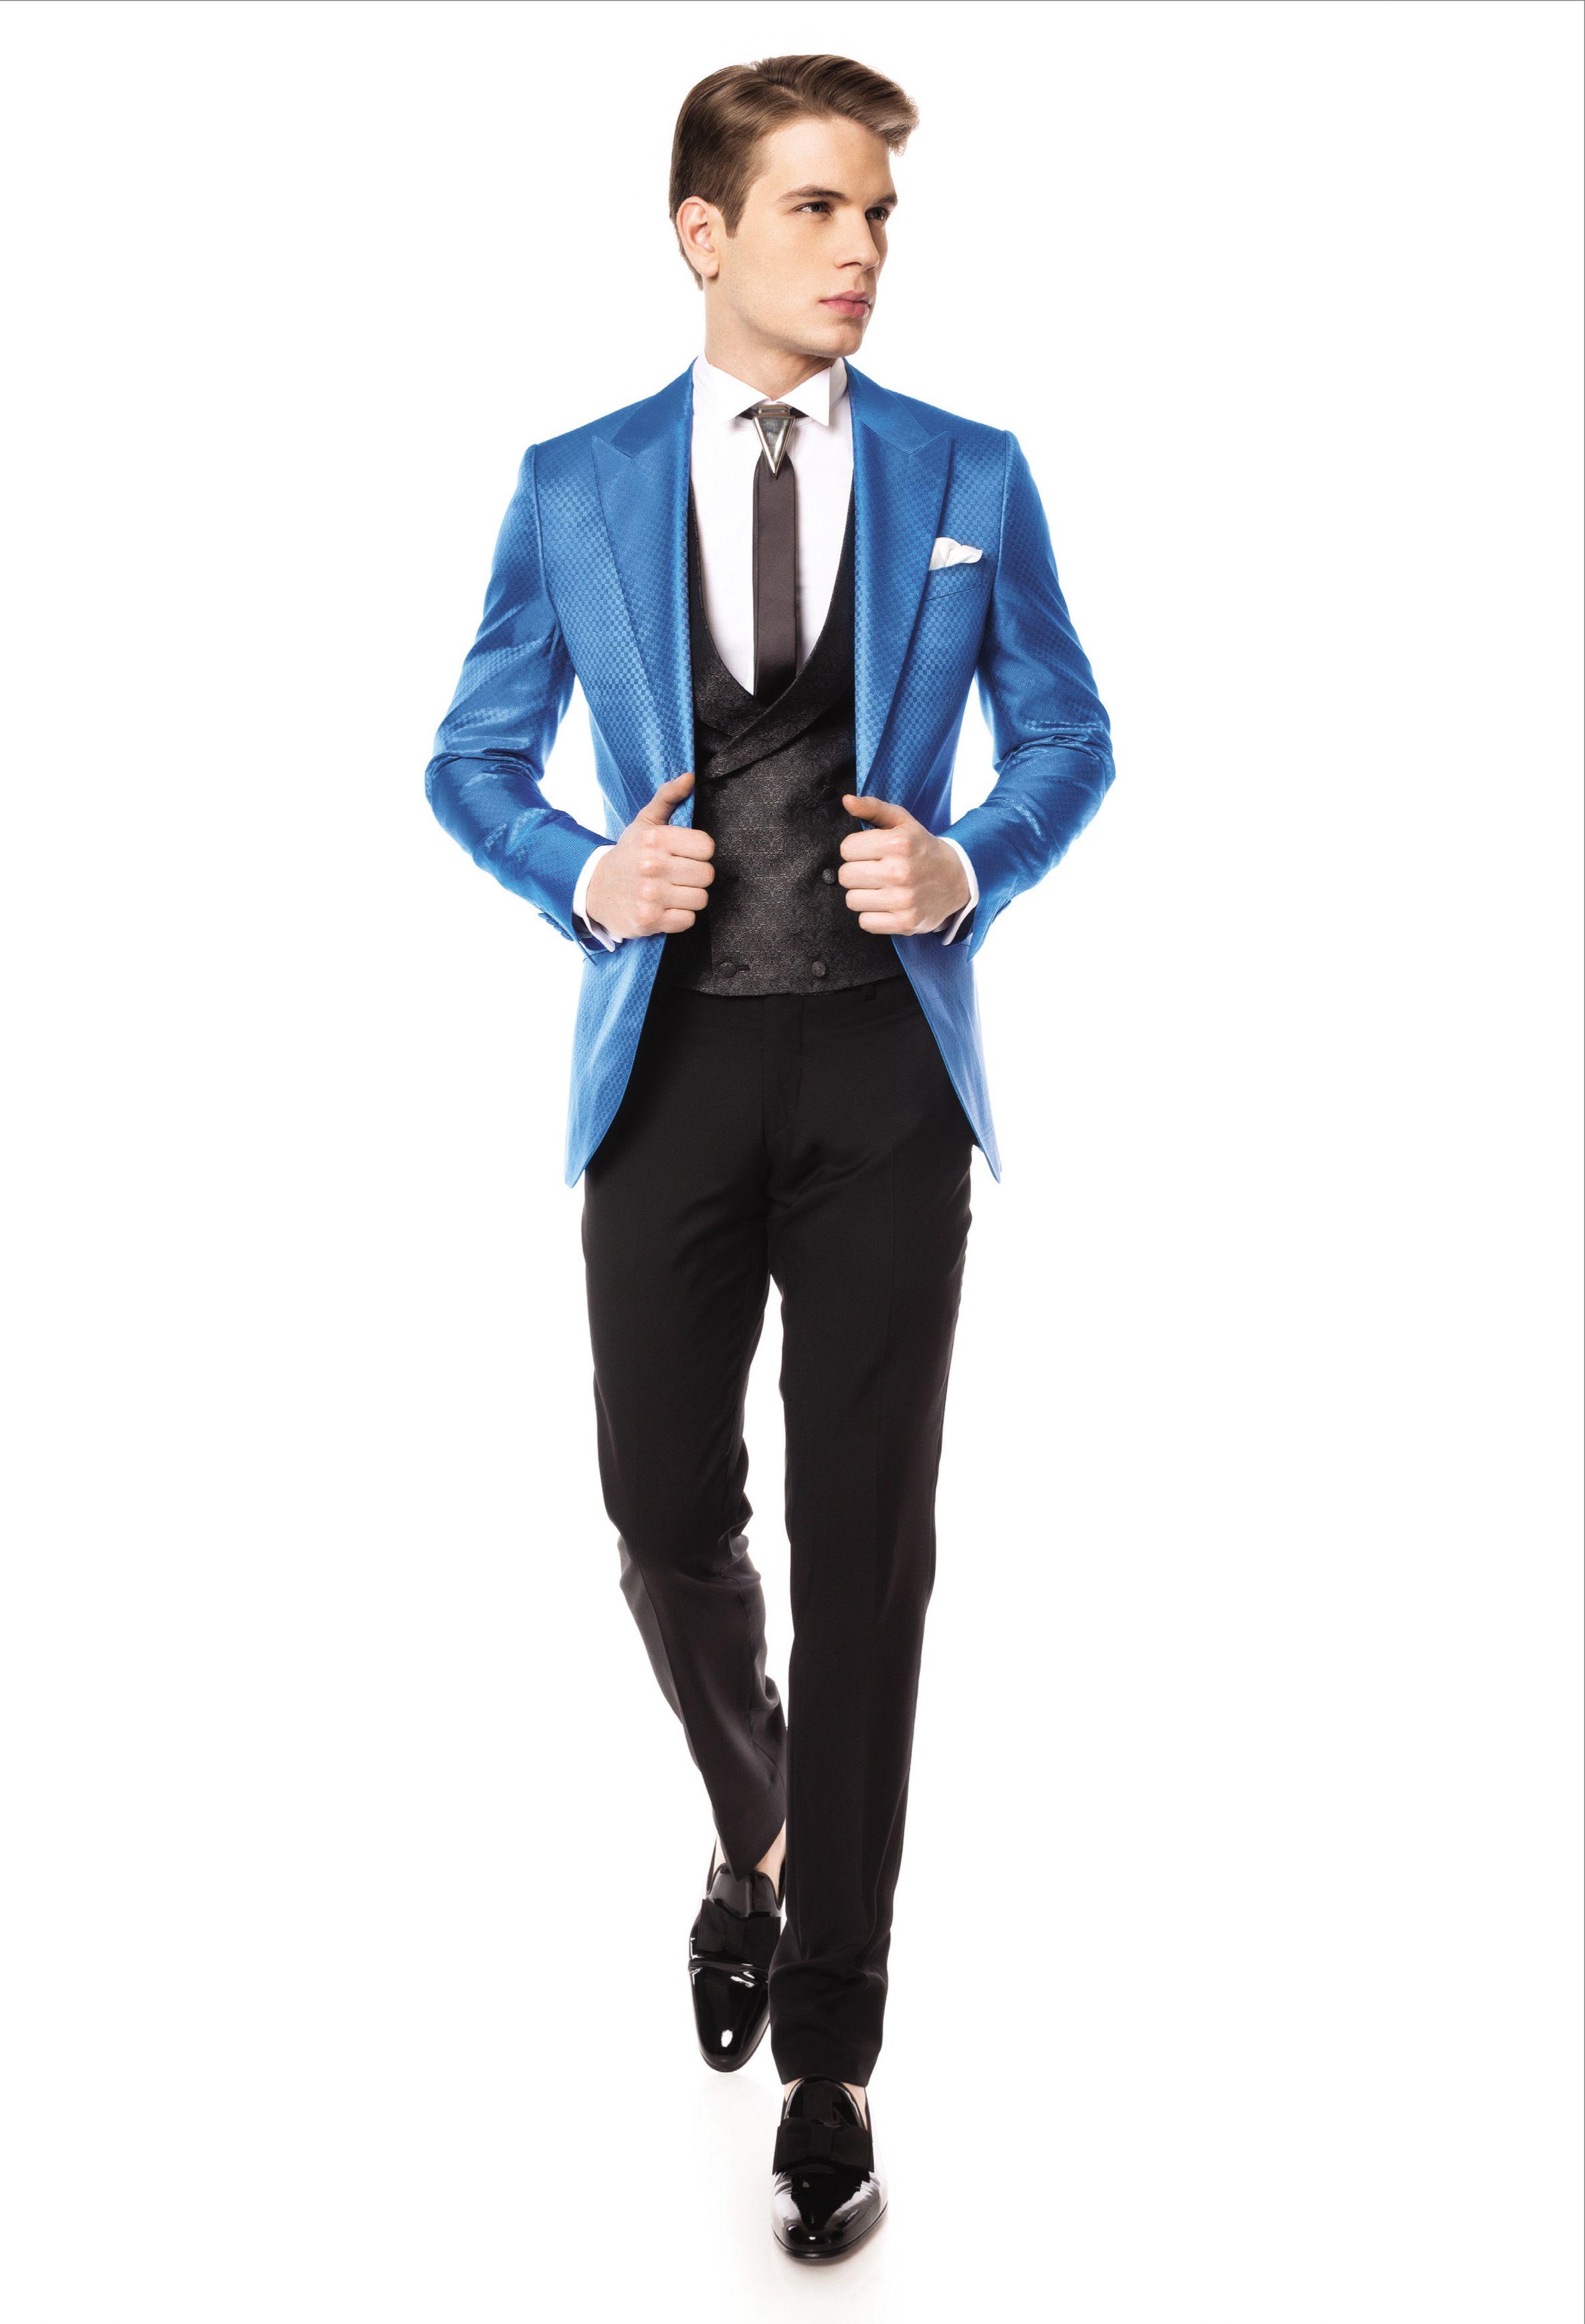 Ego Men & Fashion Concept 1